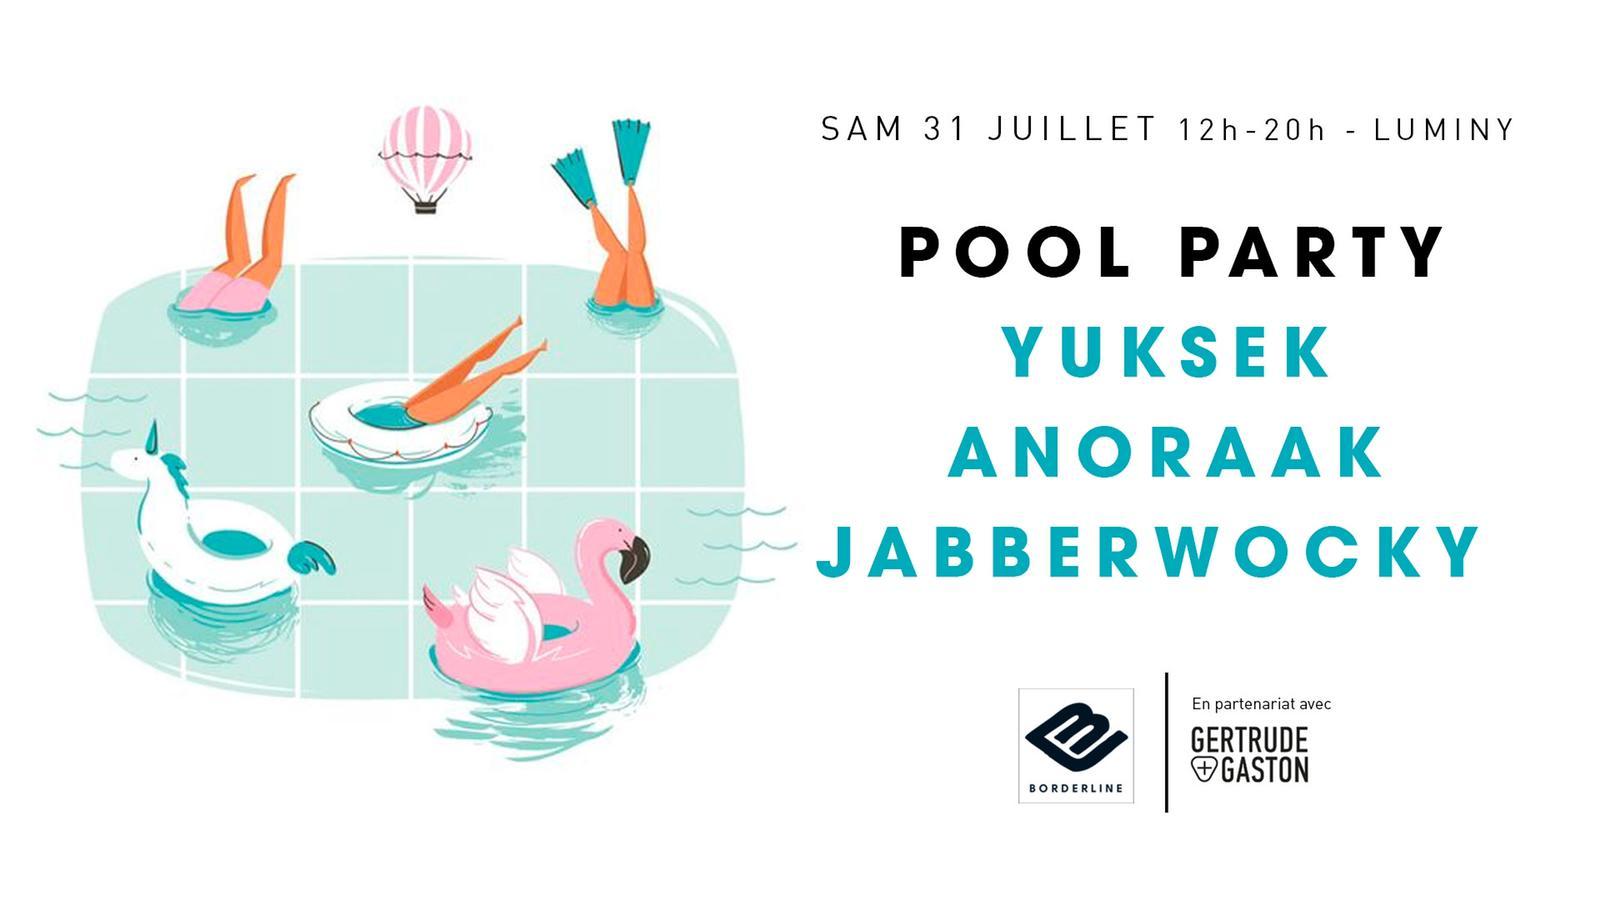 Pool Party | Yuksek + Anoraak + Jabberwocky (closing)